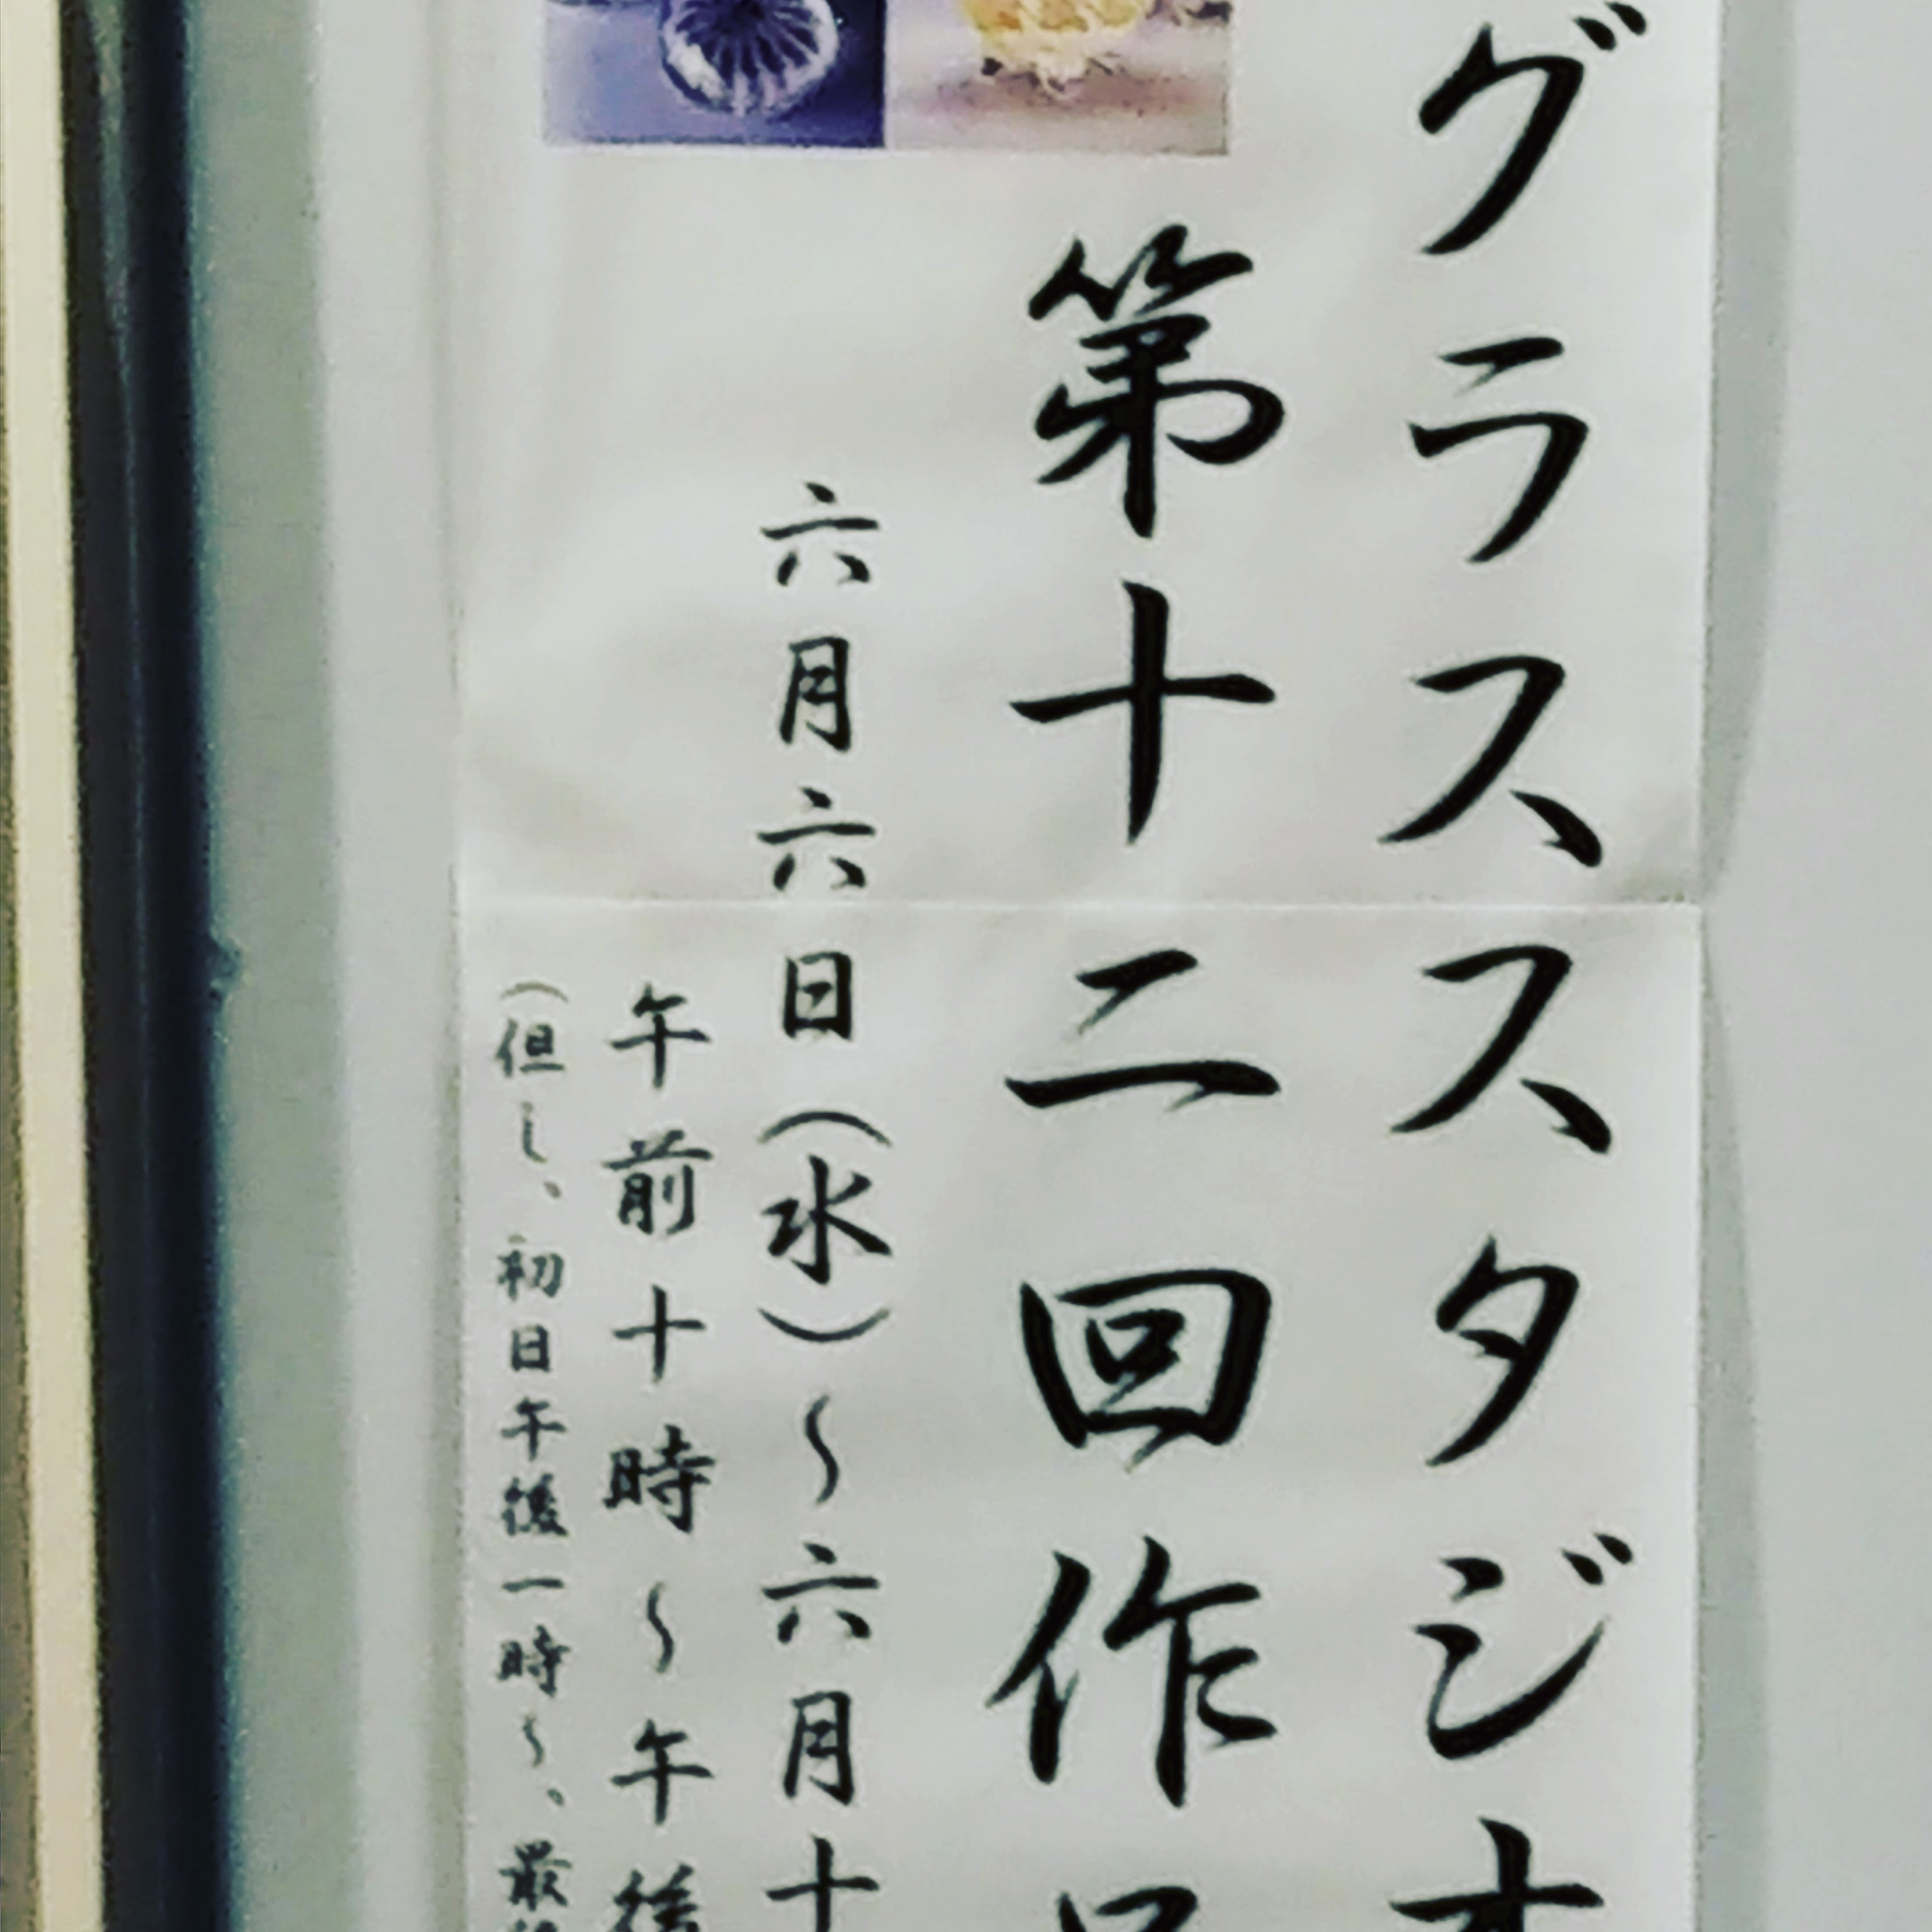 IMG_20180606_144055_264.jpg